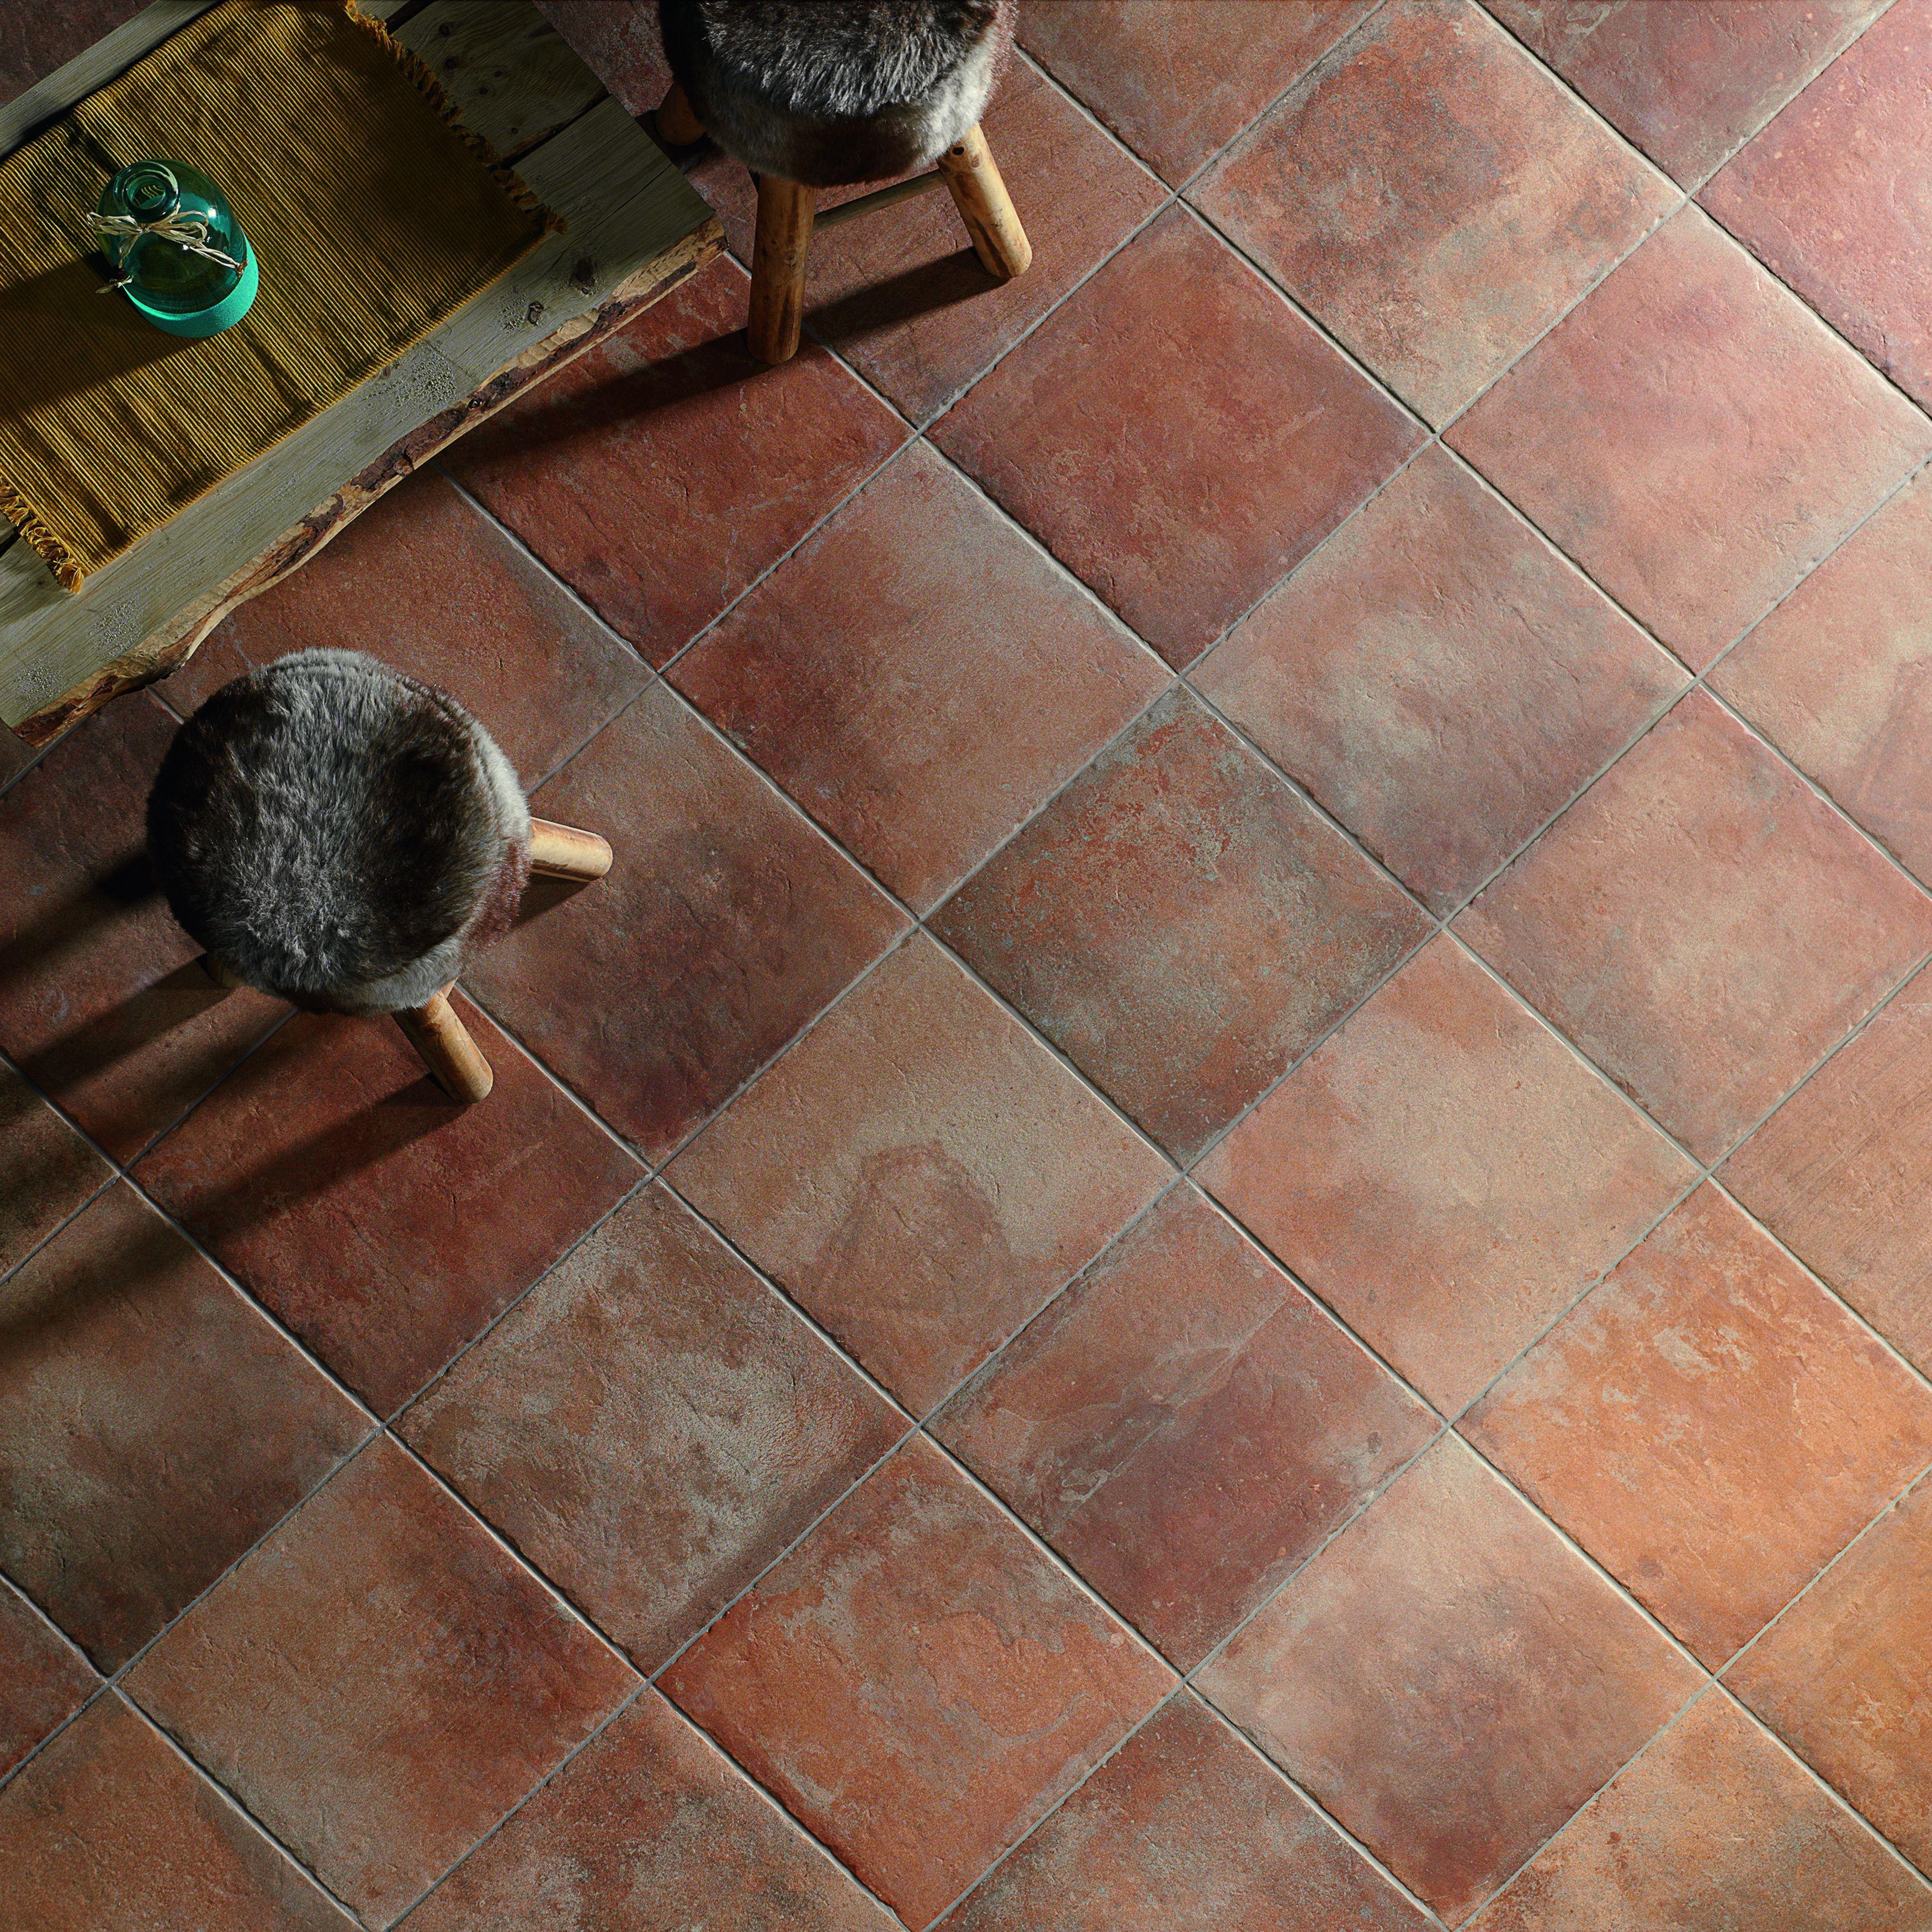 Somertile 875x875 inch suffolk north porcelain floor and wall somertile 875x875 inch suffolk north porcelain floor and wall tile case dailygadgetfo Image collections